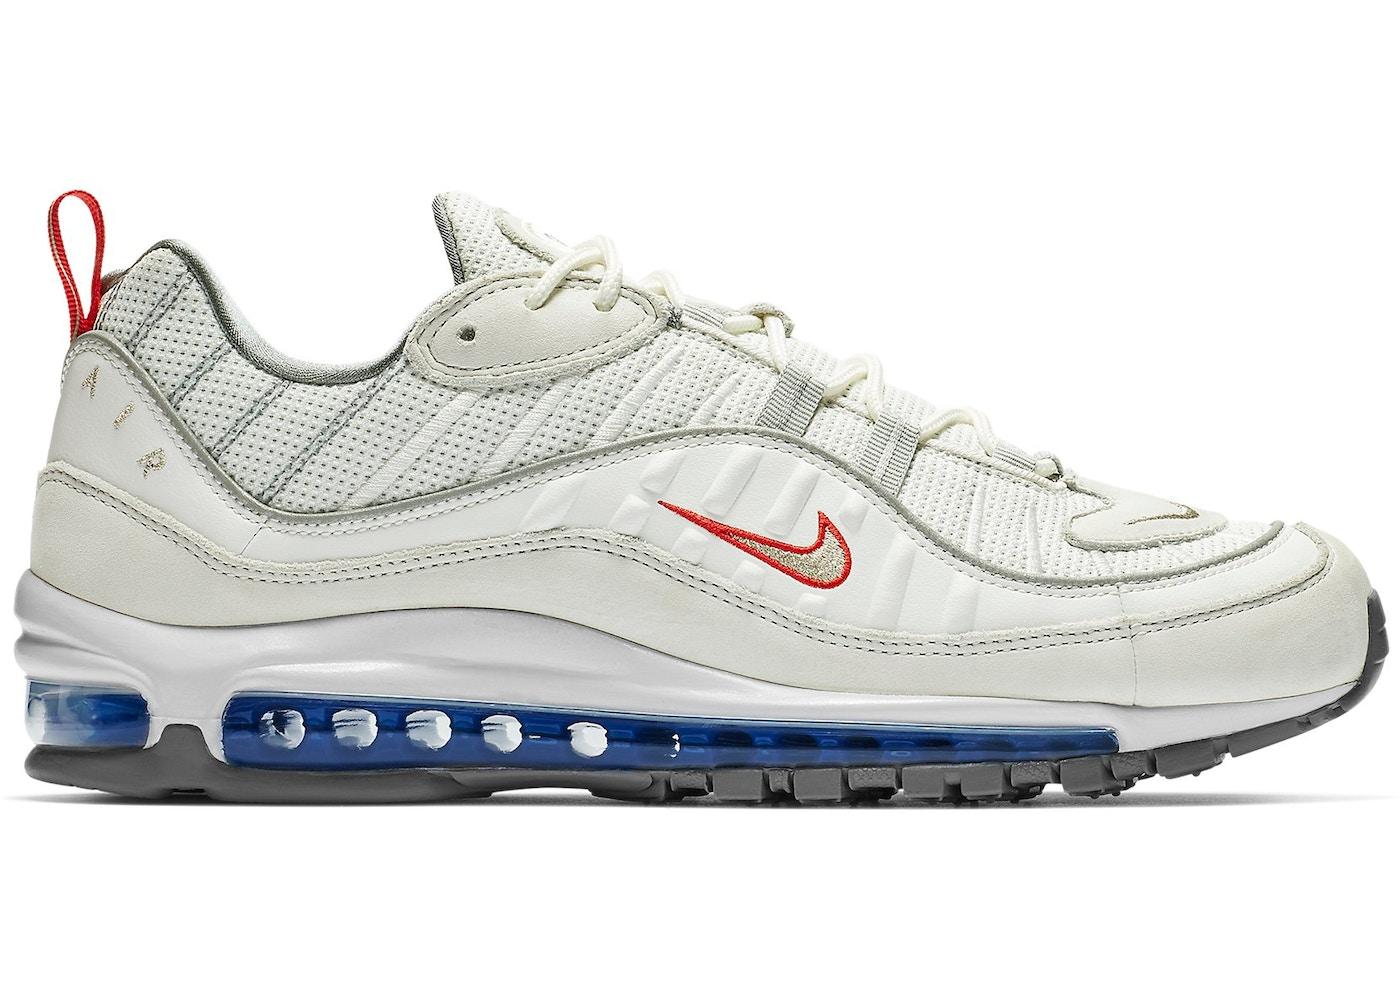 c5c7727777 Buy Nike Air Max 98 Shoes & Deadstock Sneakers